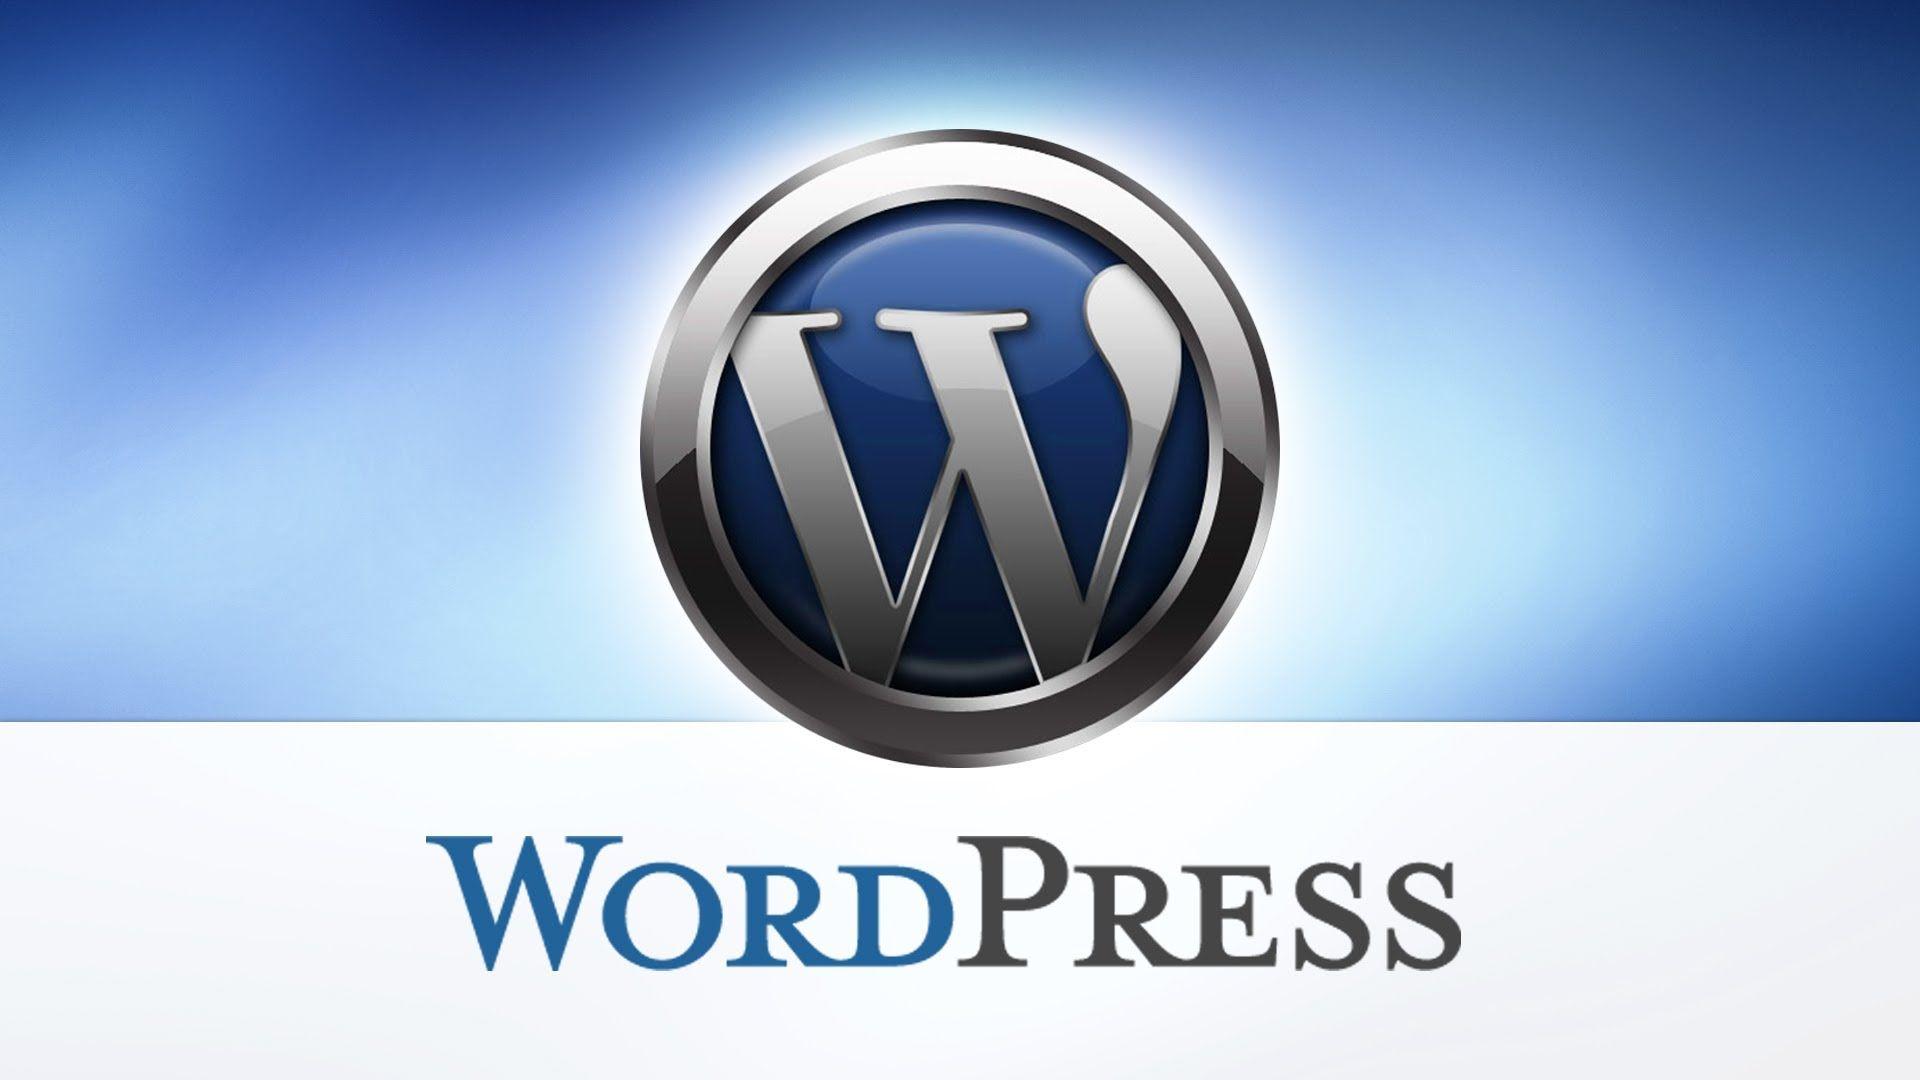 10 Best Wordpress Courses & Tutorials - Learn Wordpress Online